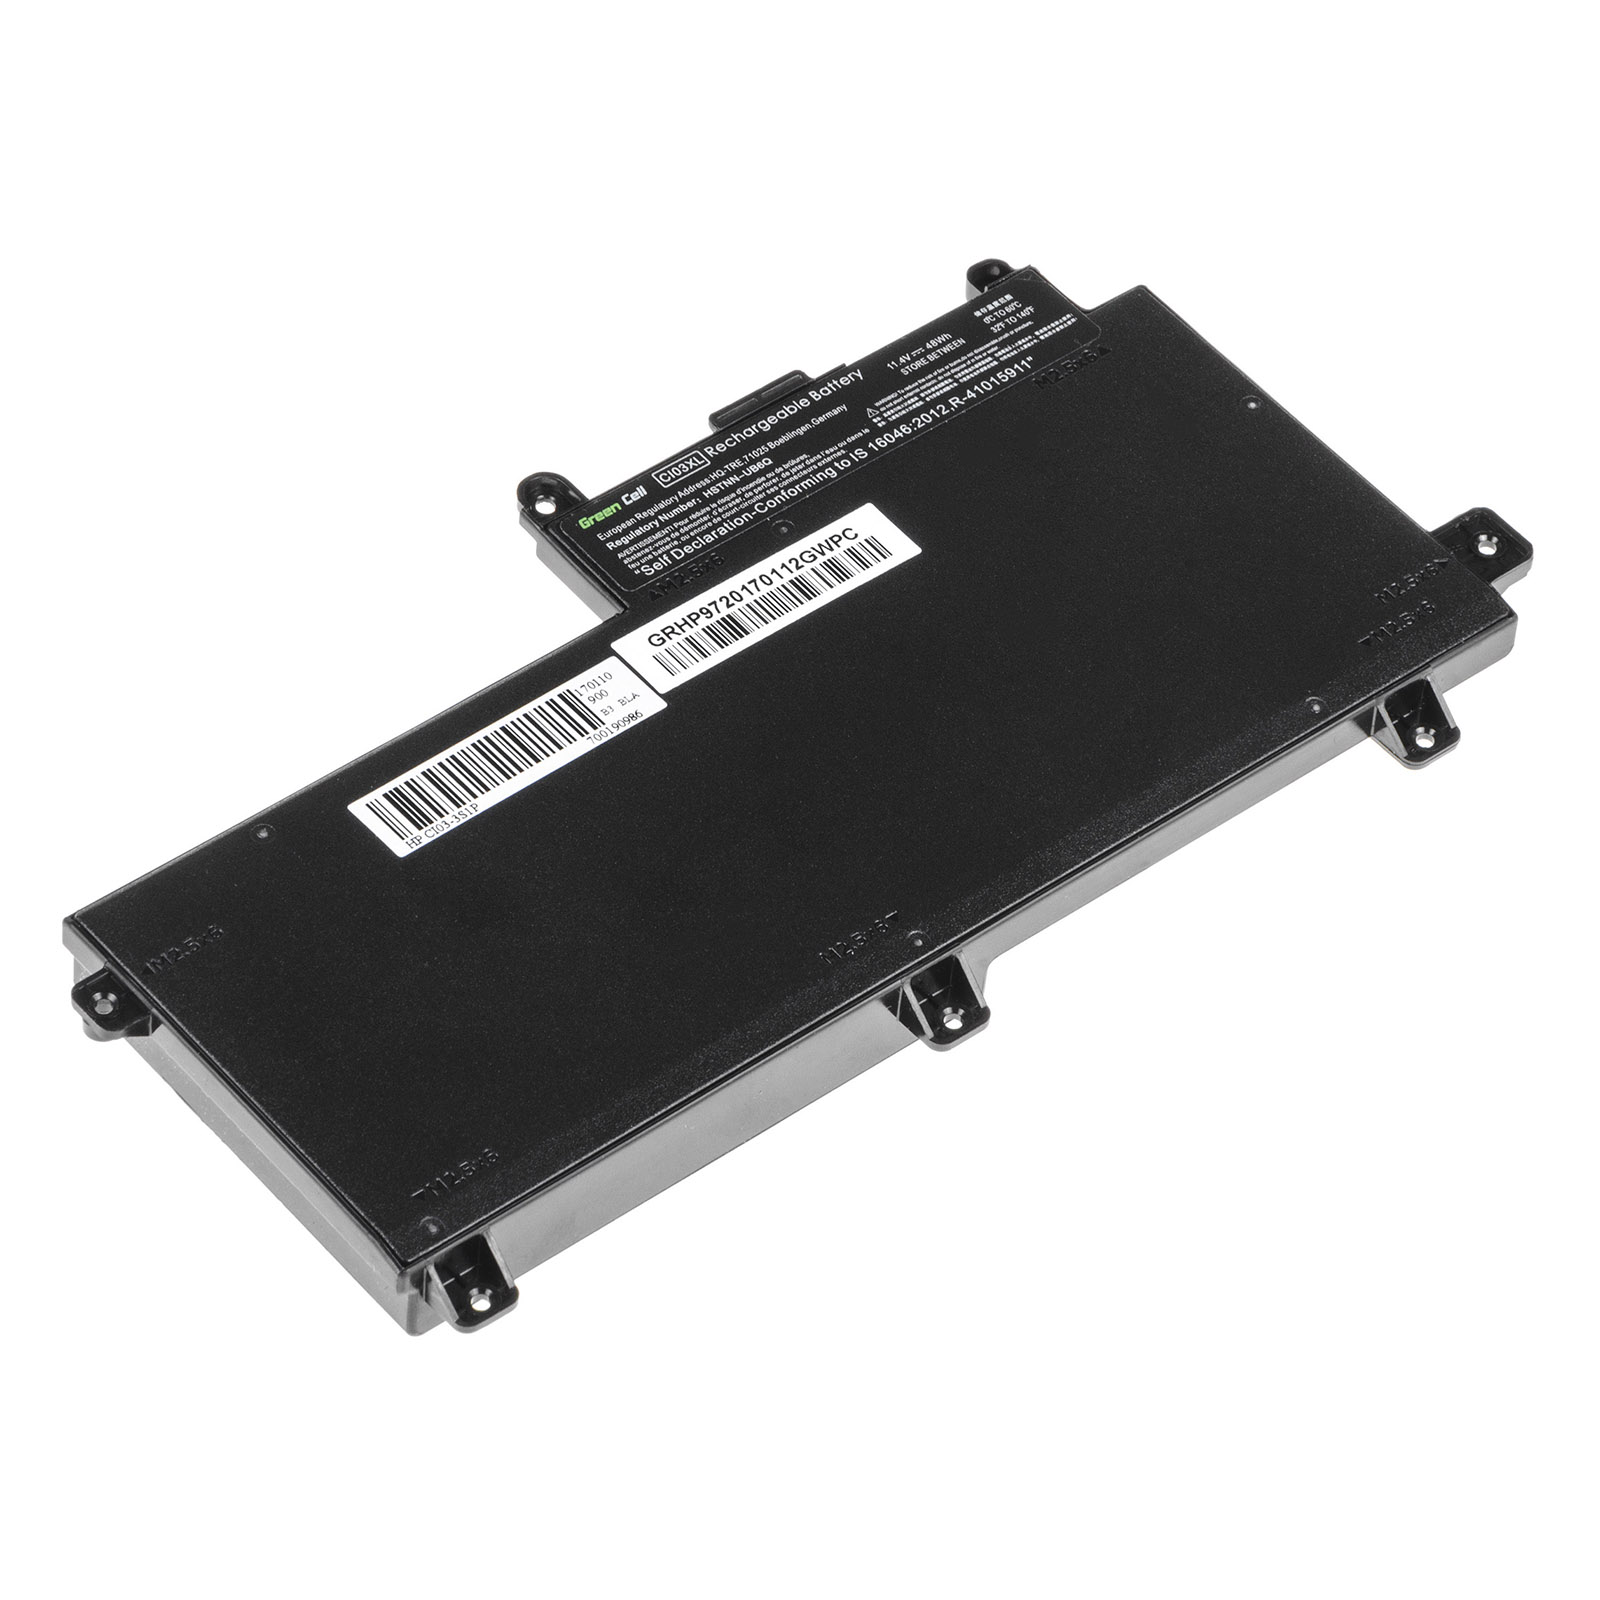 Bateria-para-HP-ProBook-650-G3-Ordenador-4200mAh